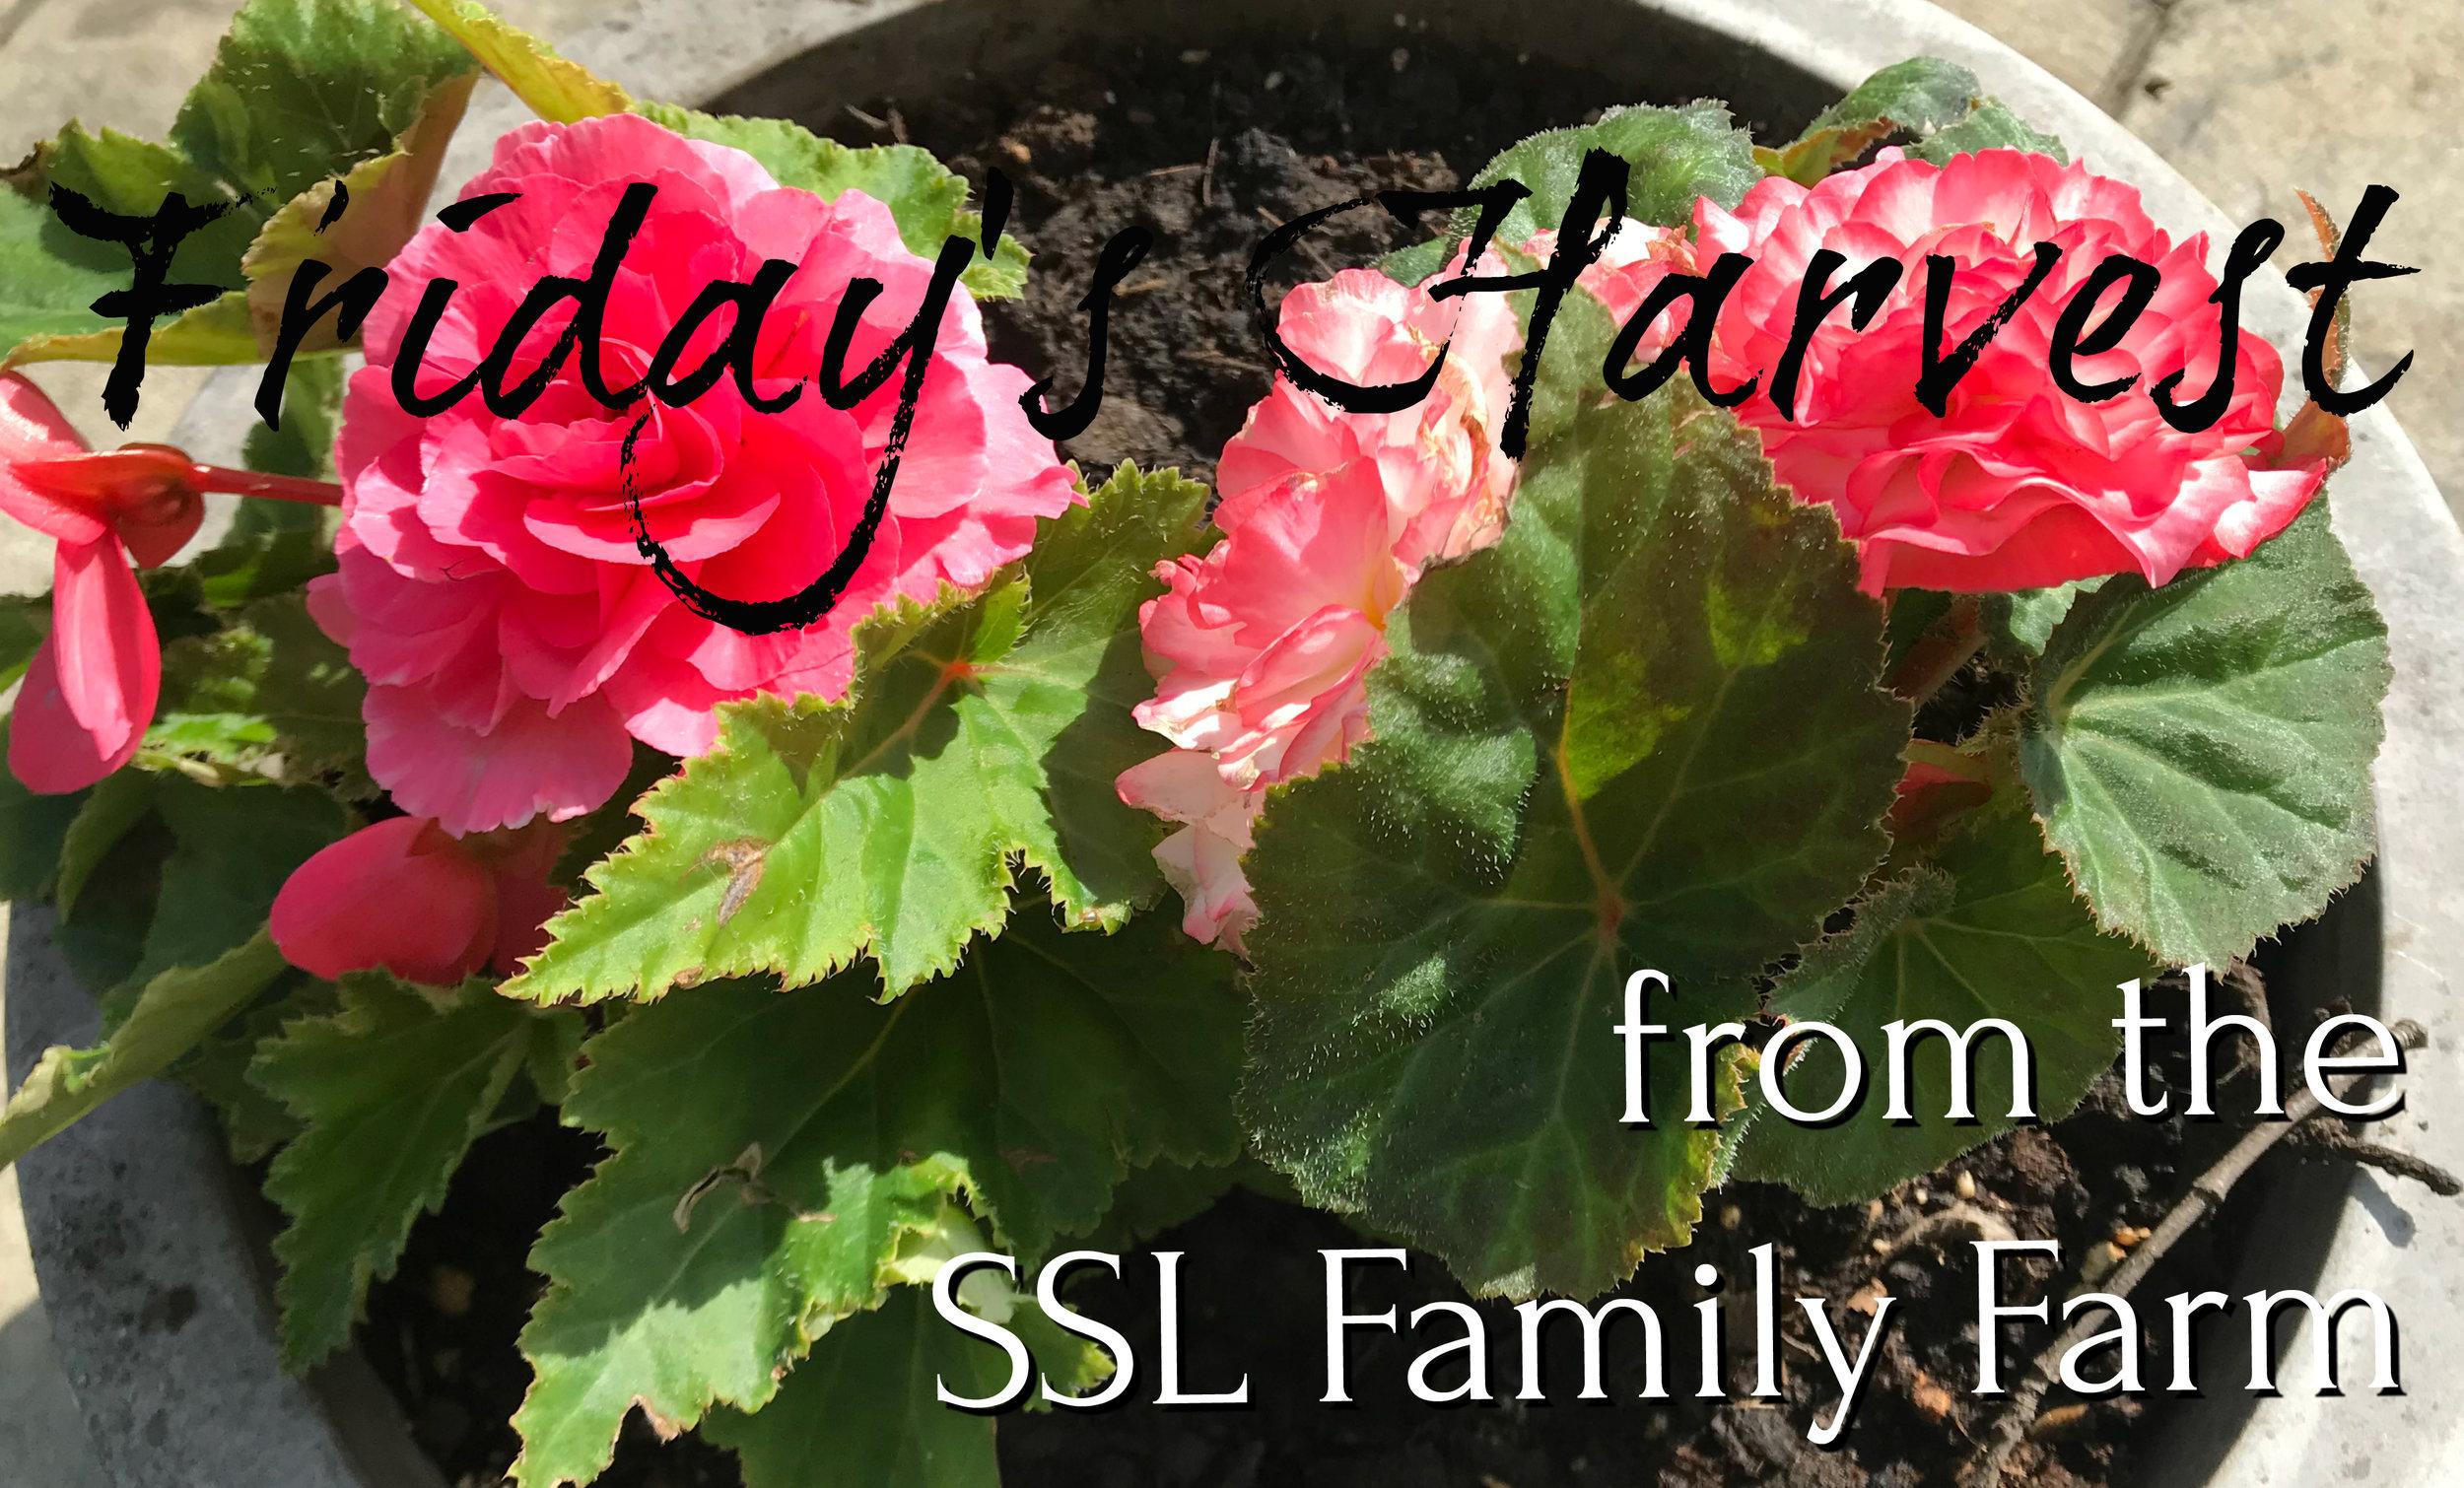 Fridays Harvest 051818 Thumbnail.jpg